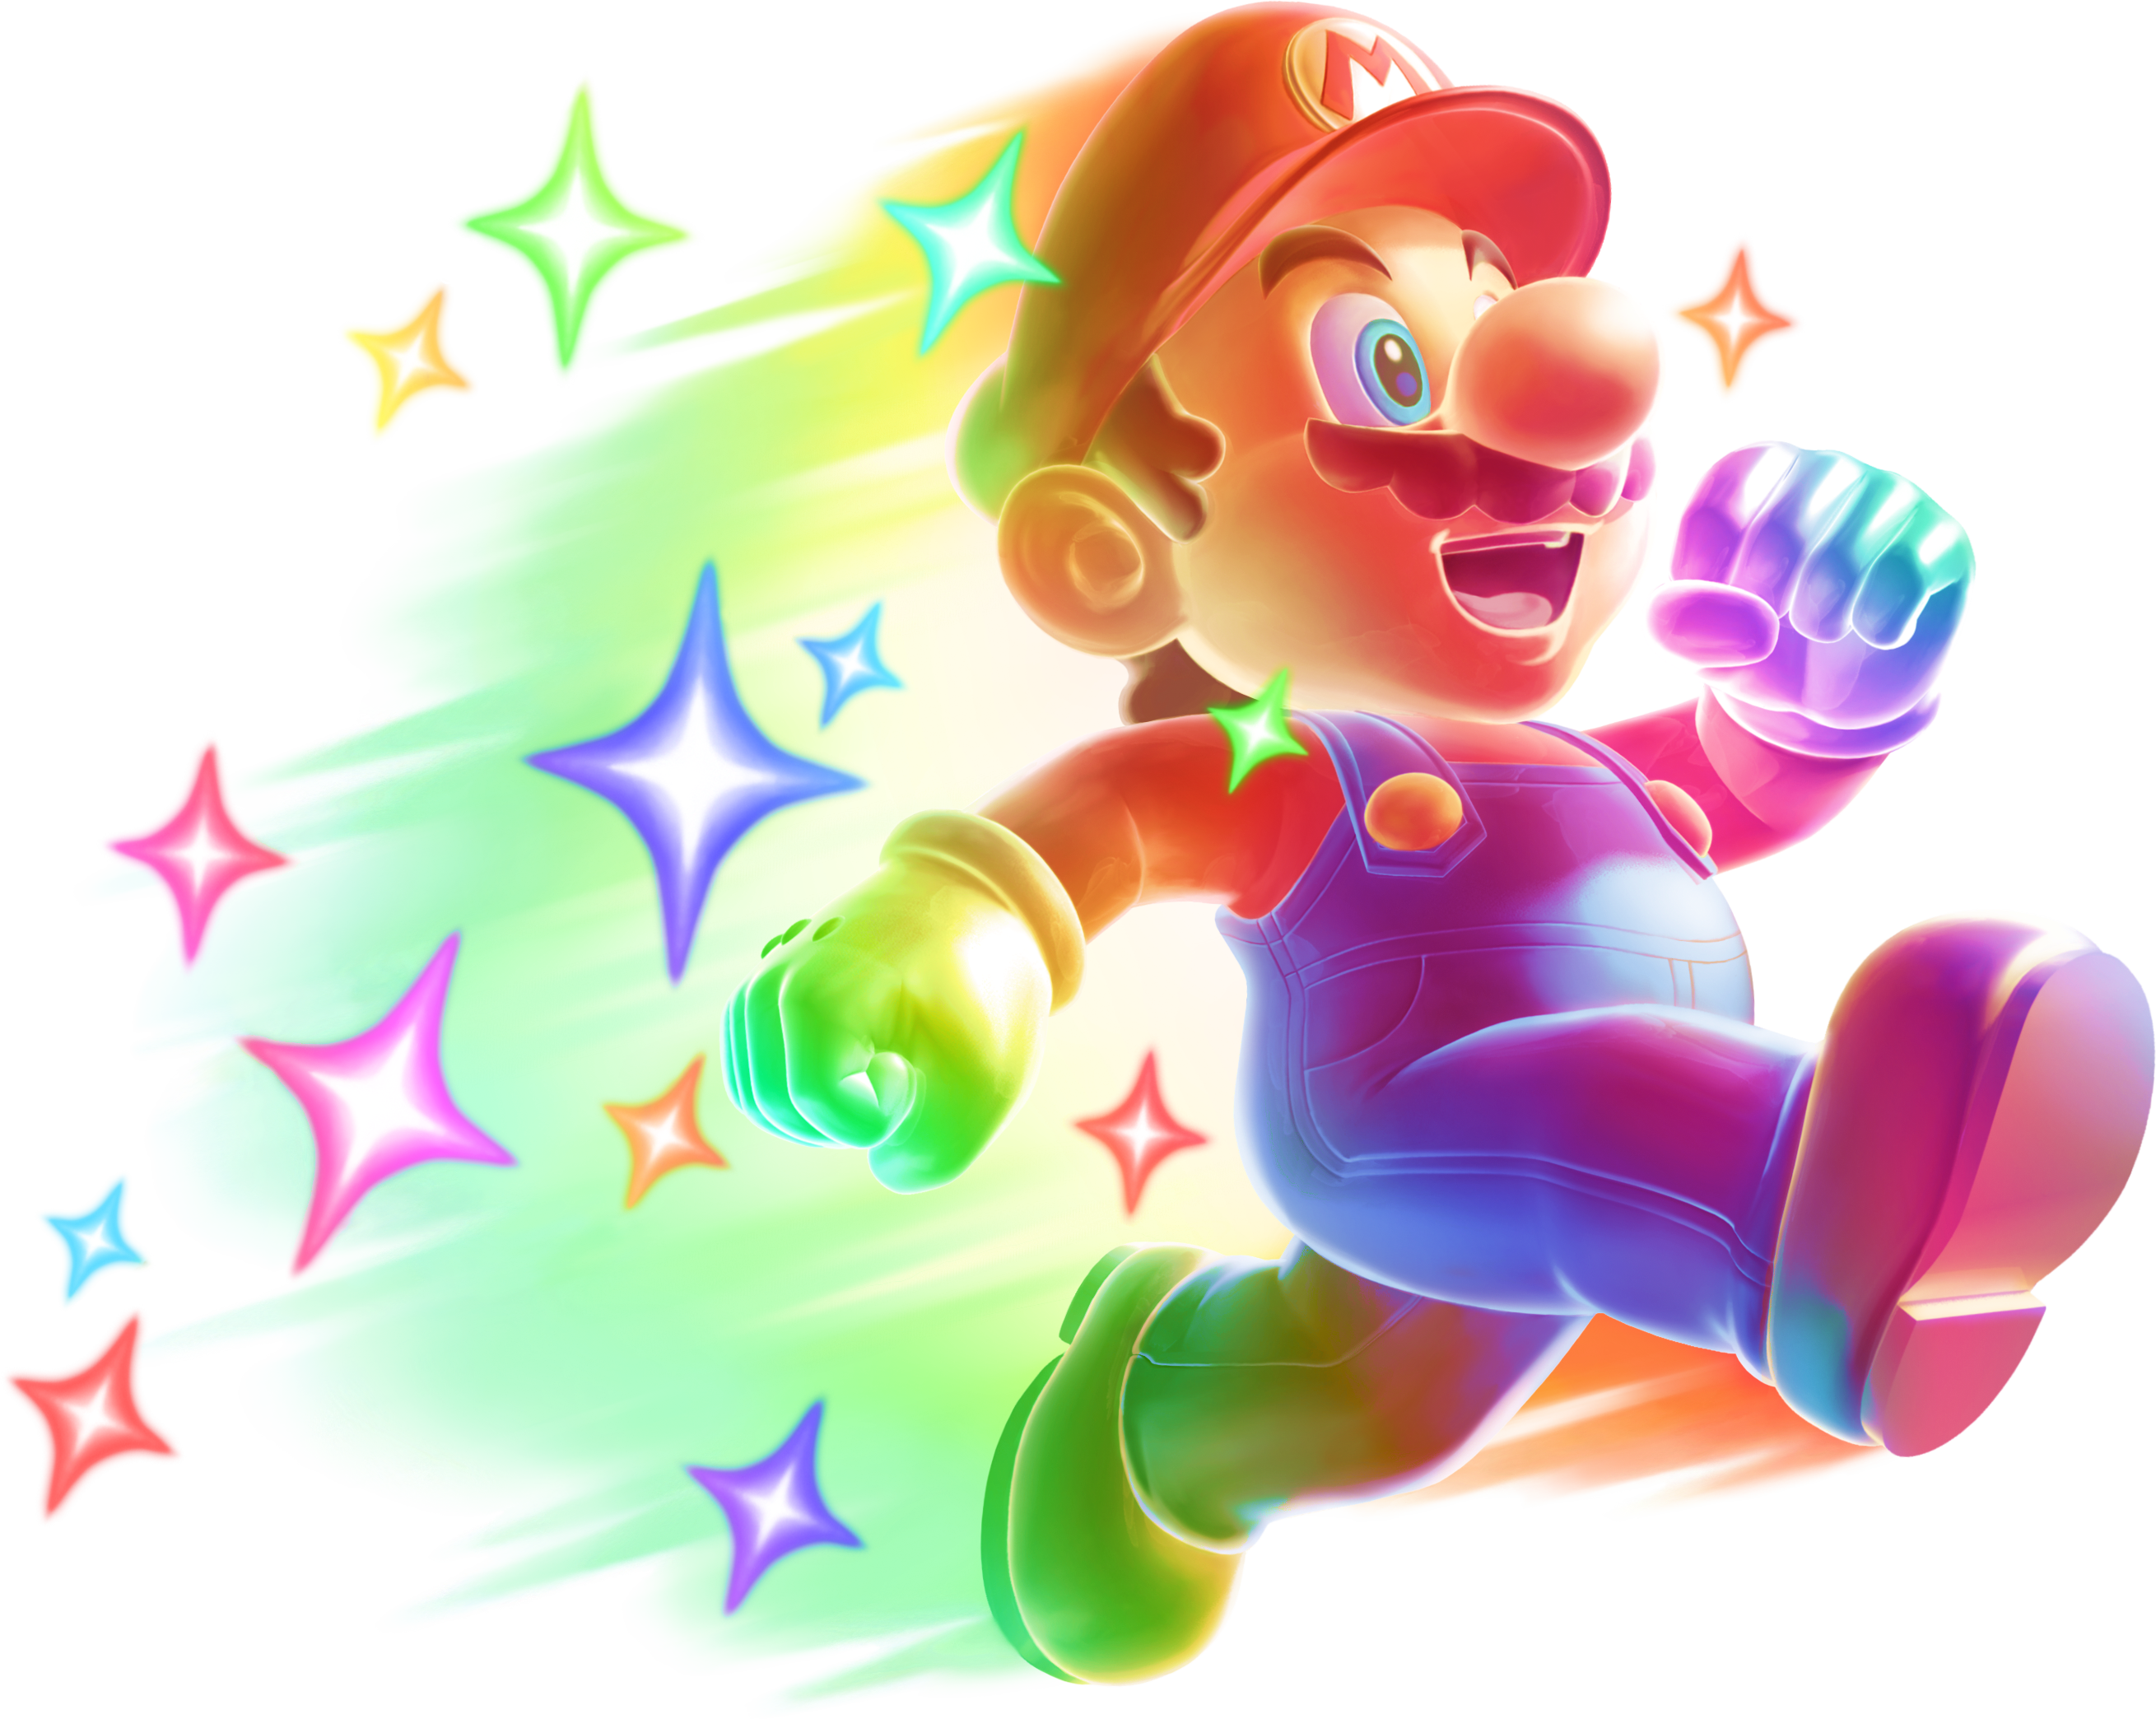 Star power clipart graphic free library Mario Sports All-Star Royale | Fantendo - Nintendo Fanon Wiki ... graphic free library